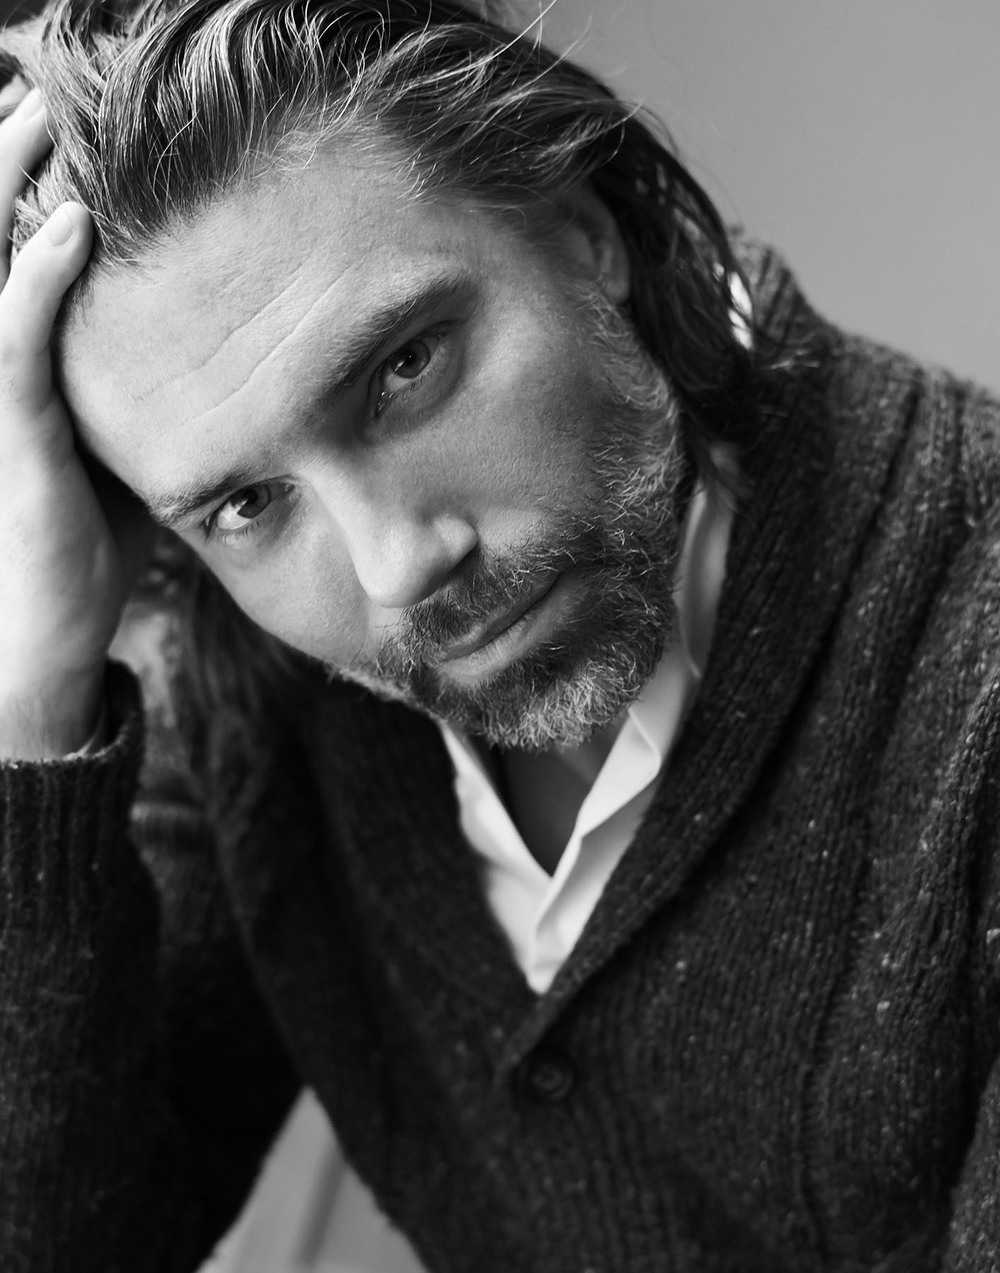 Anson Mount / Actor